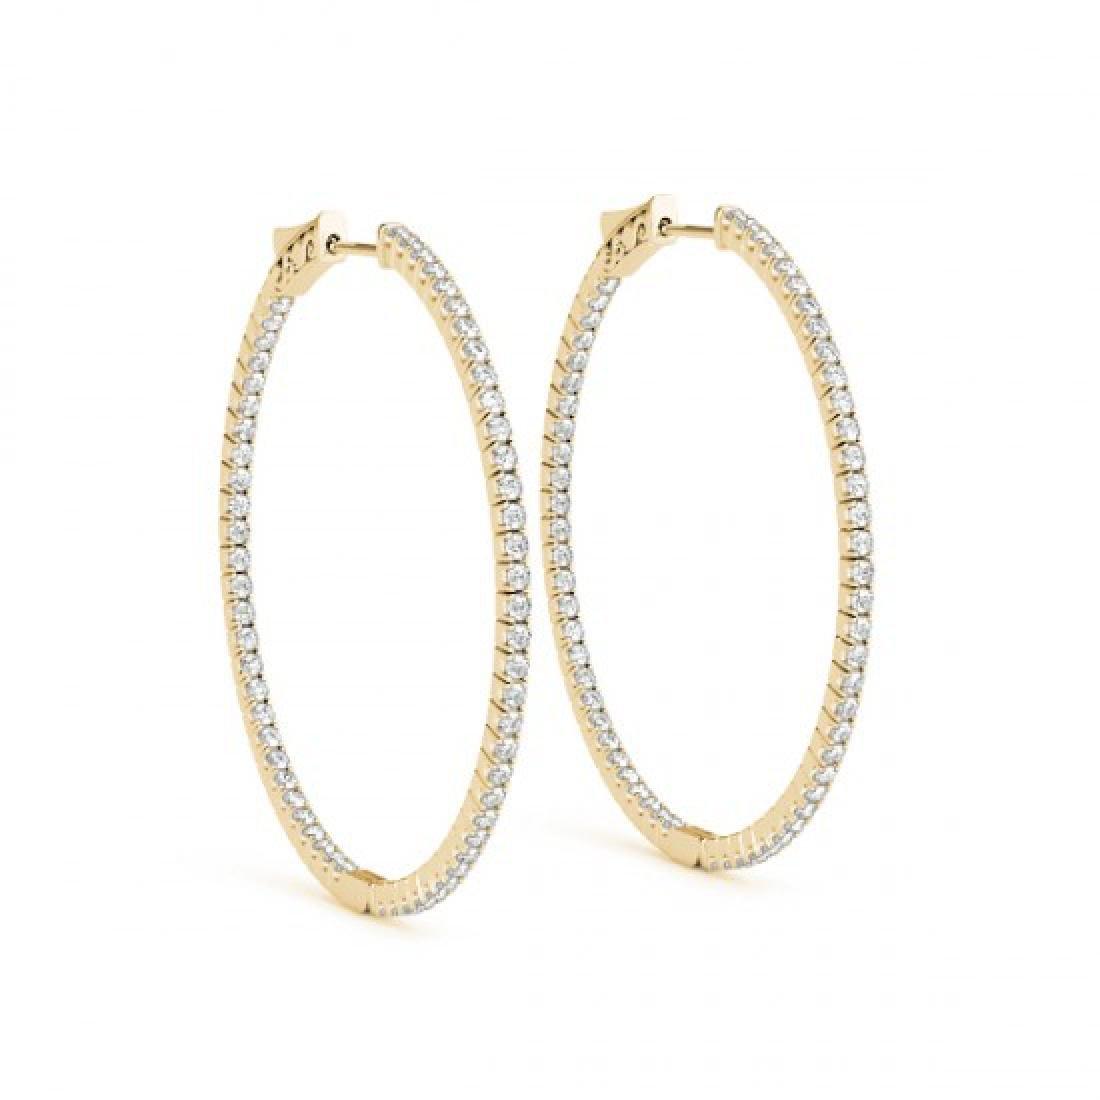 0.5 CTW Diamond VS/SI Certified 20 Mm Hoop Earrings 14K - 2